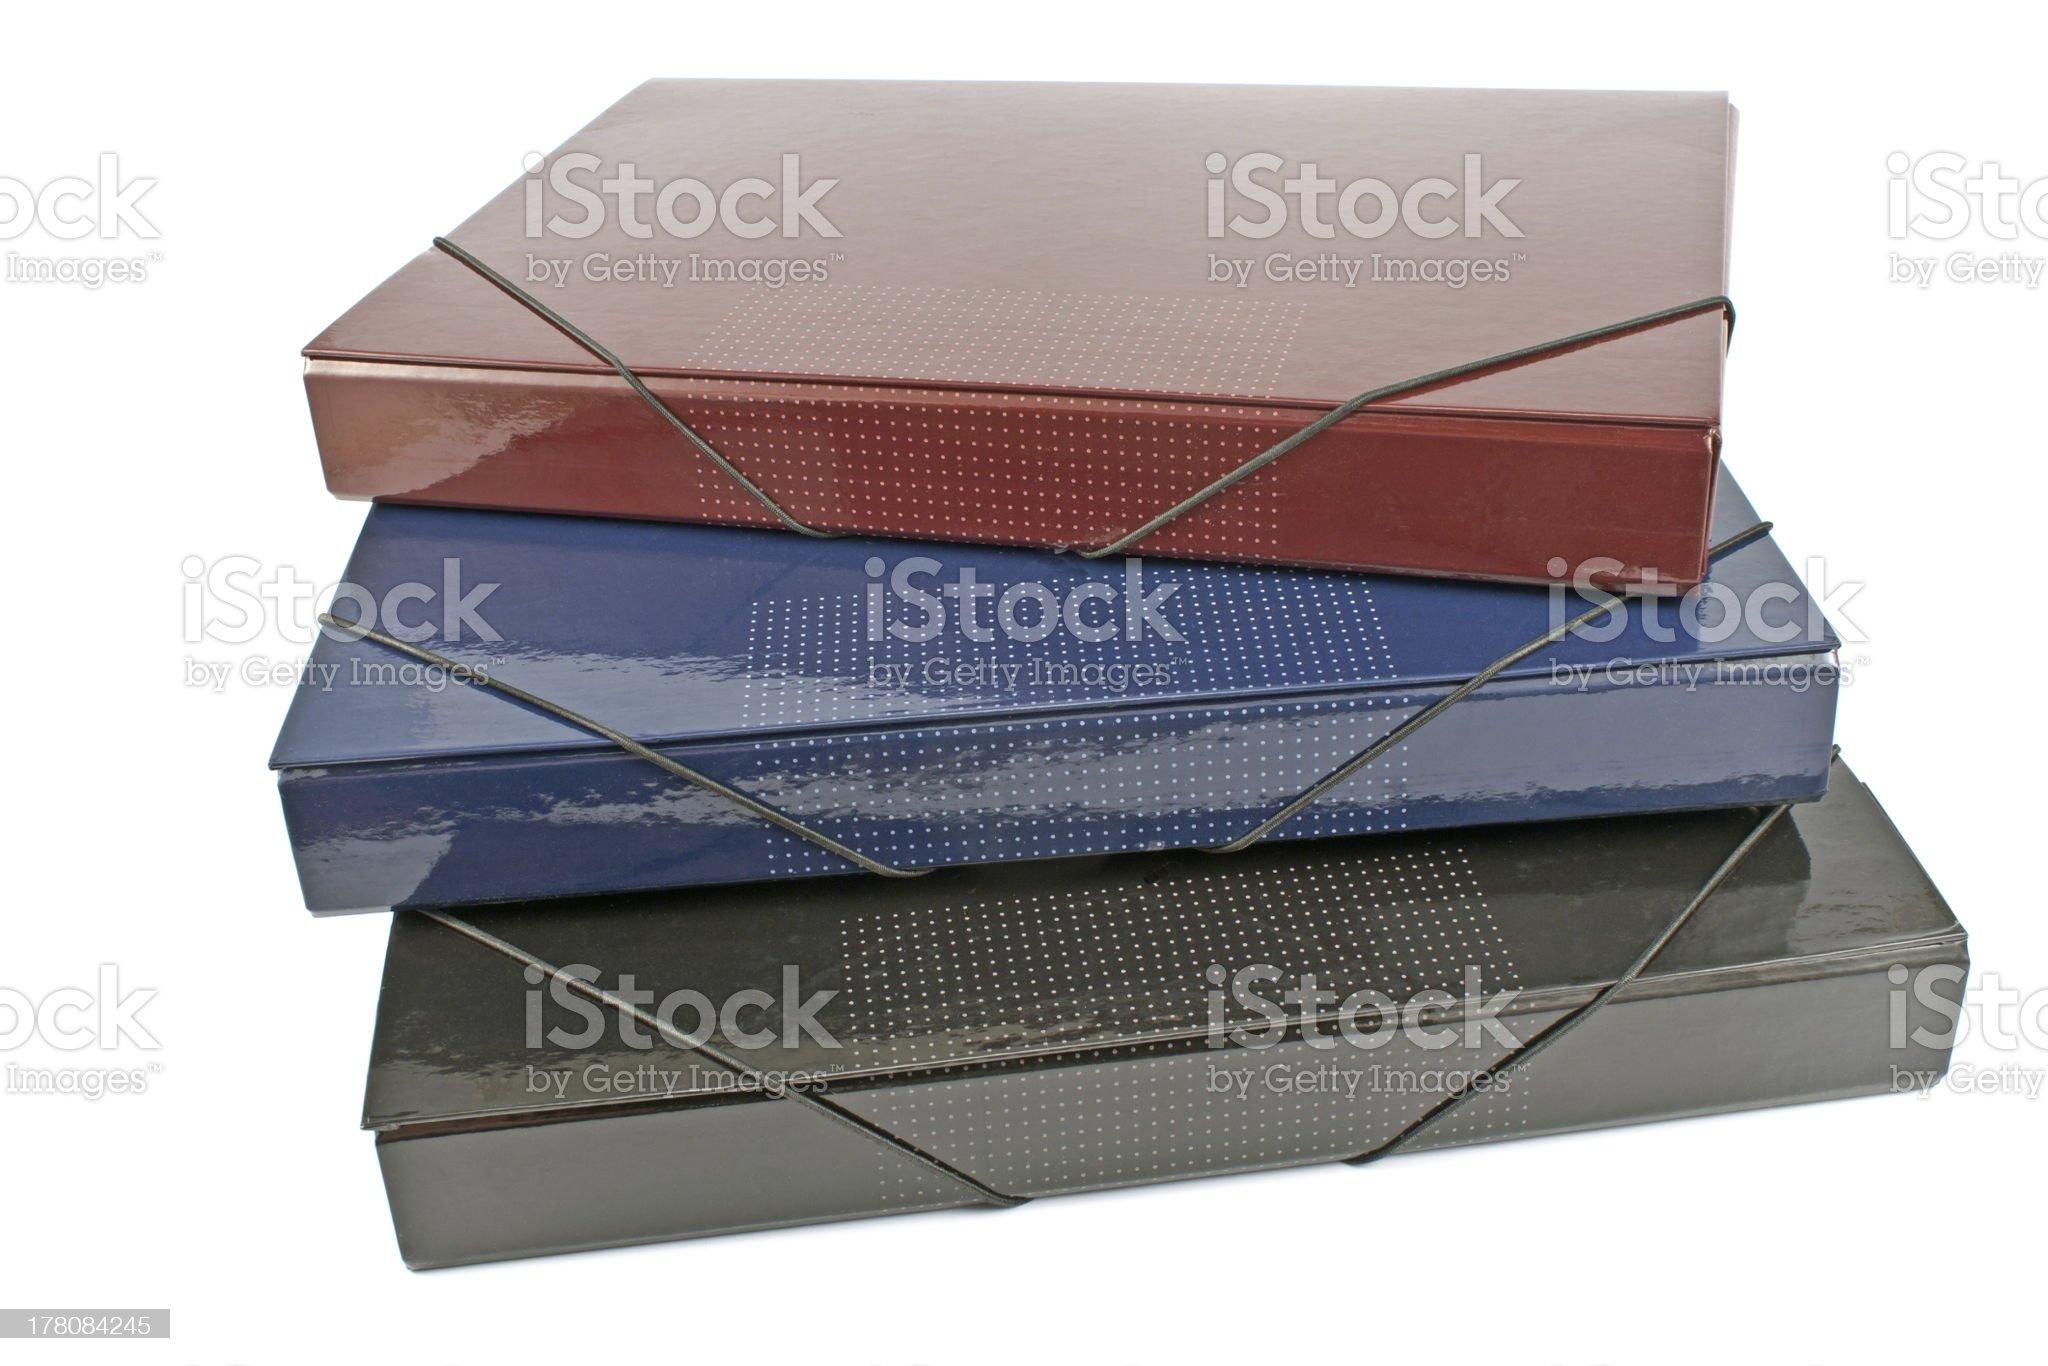 Three portfolio folders royalty-free stock photo